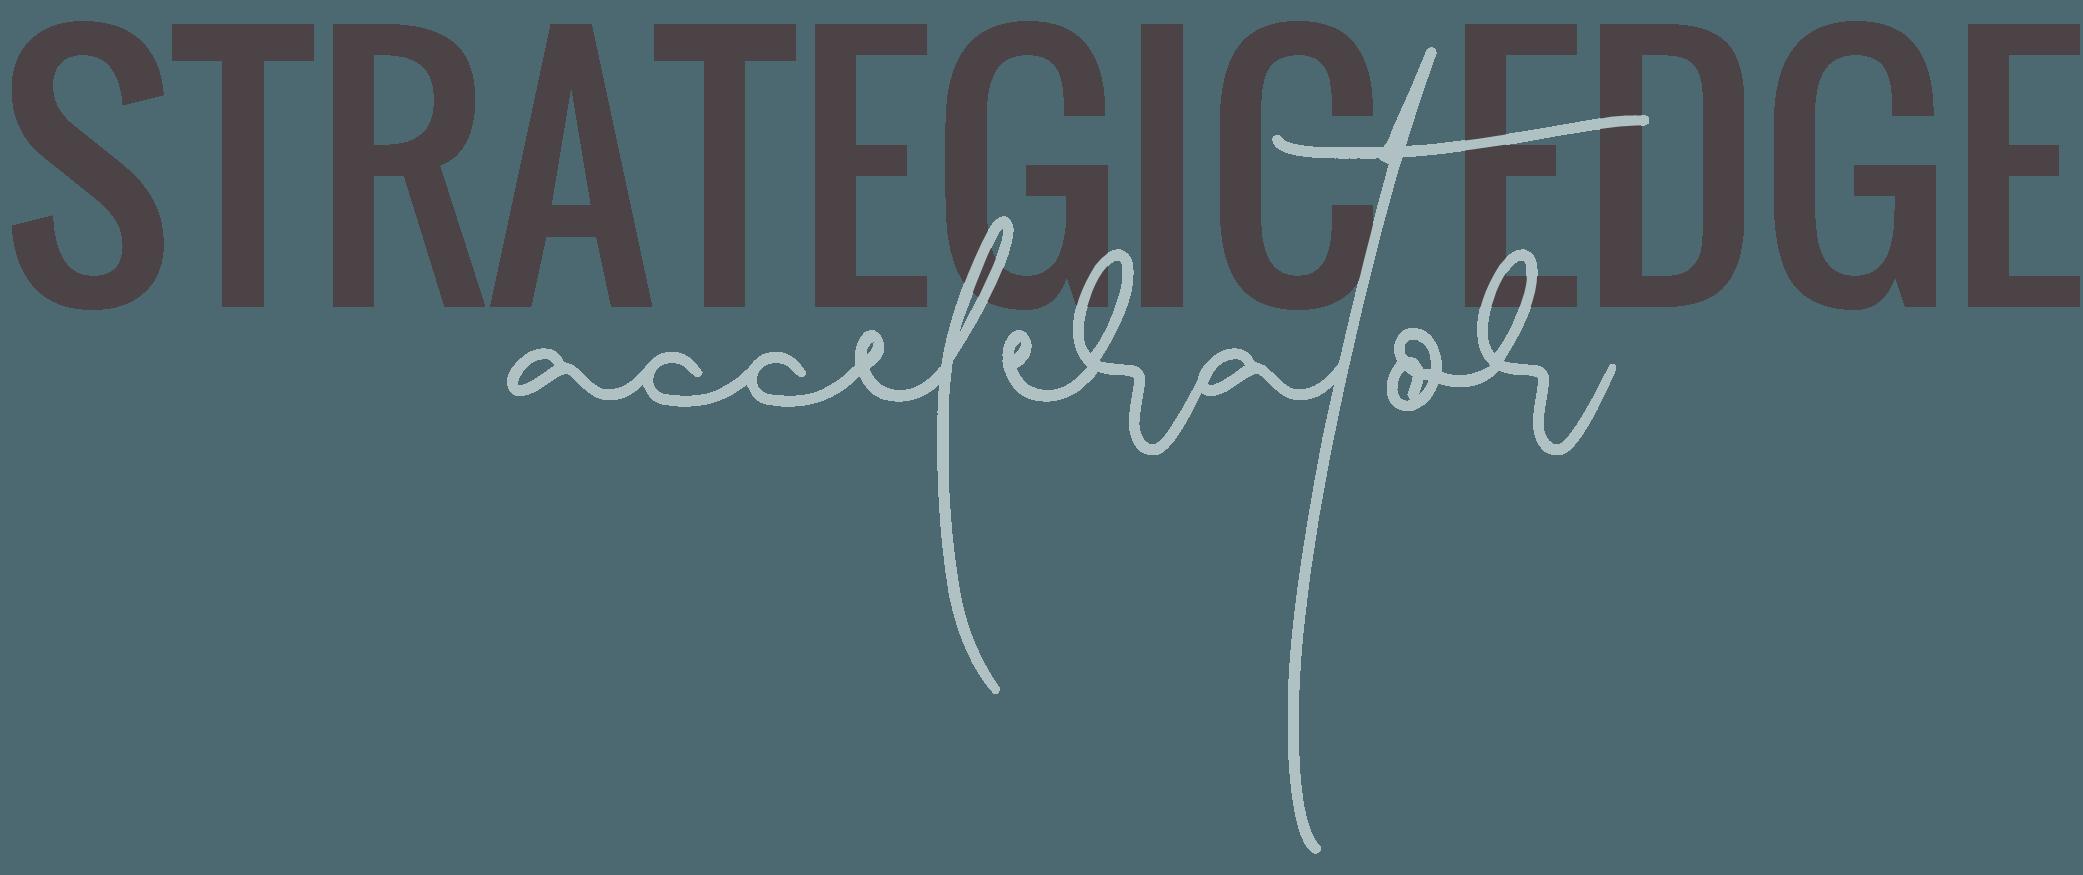 Strategic Edge Accelerator (Logo BTS) - Sabine Biesenberger